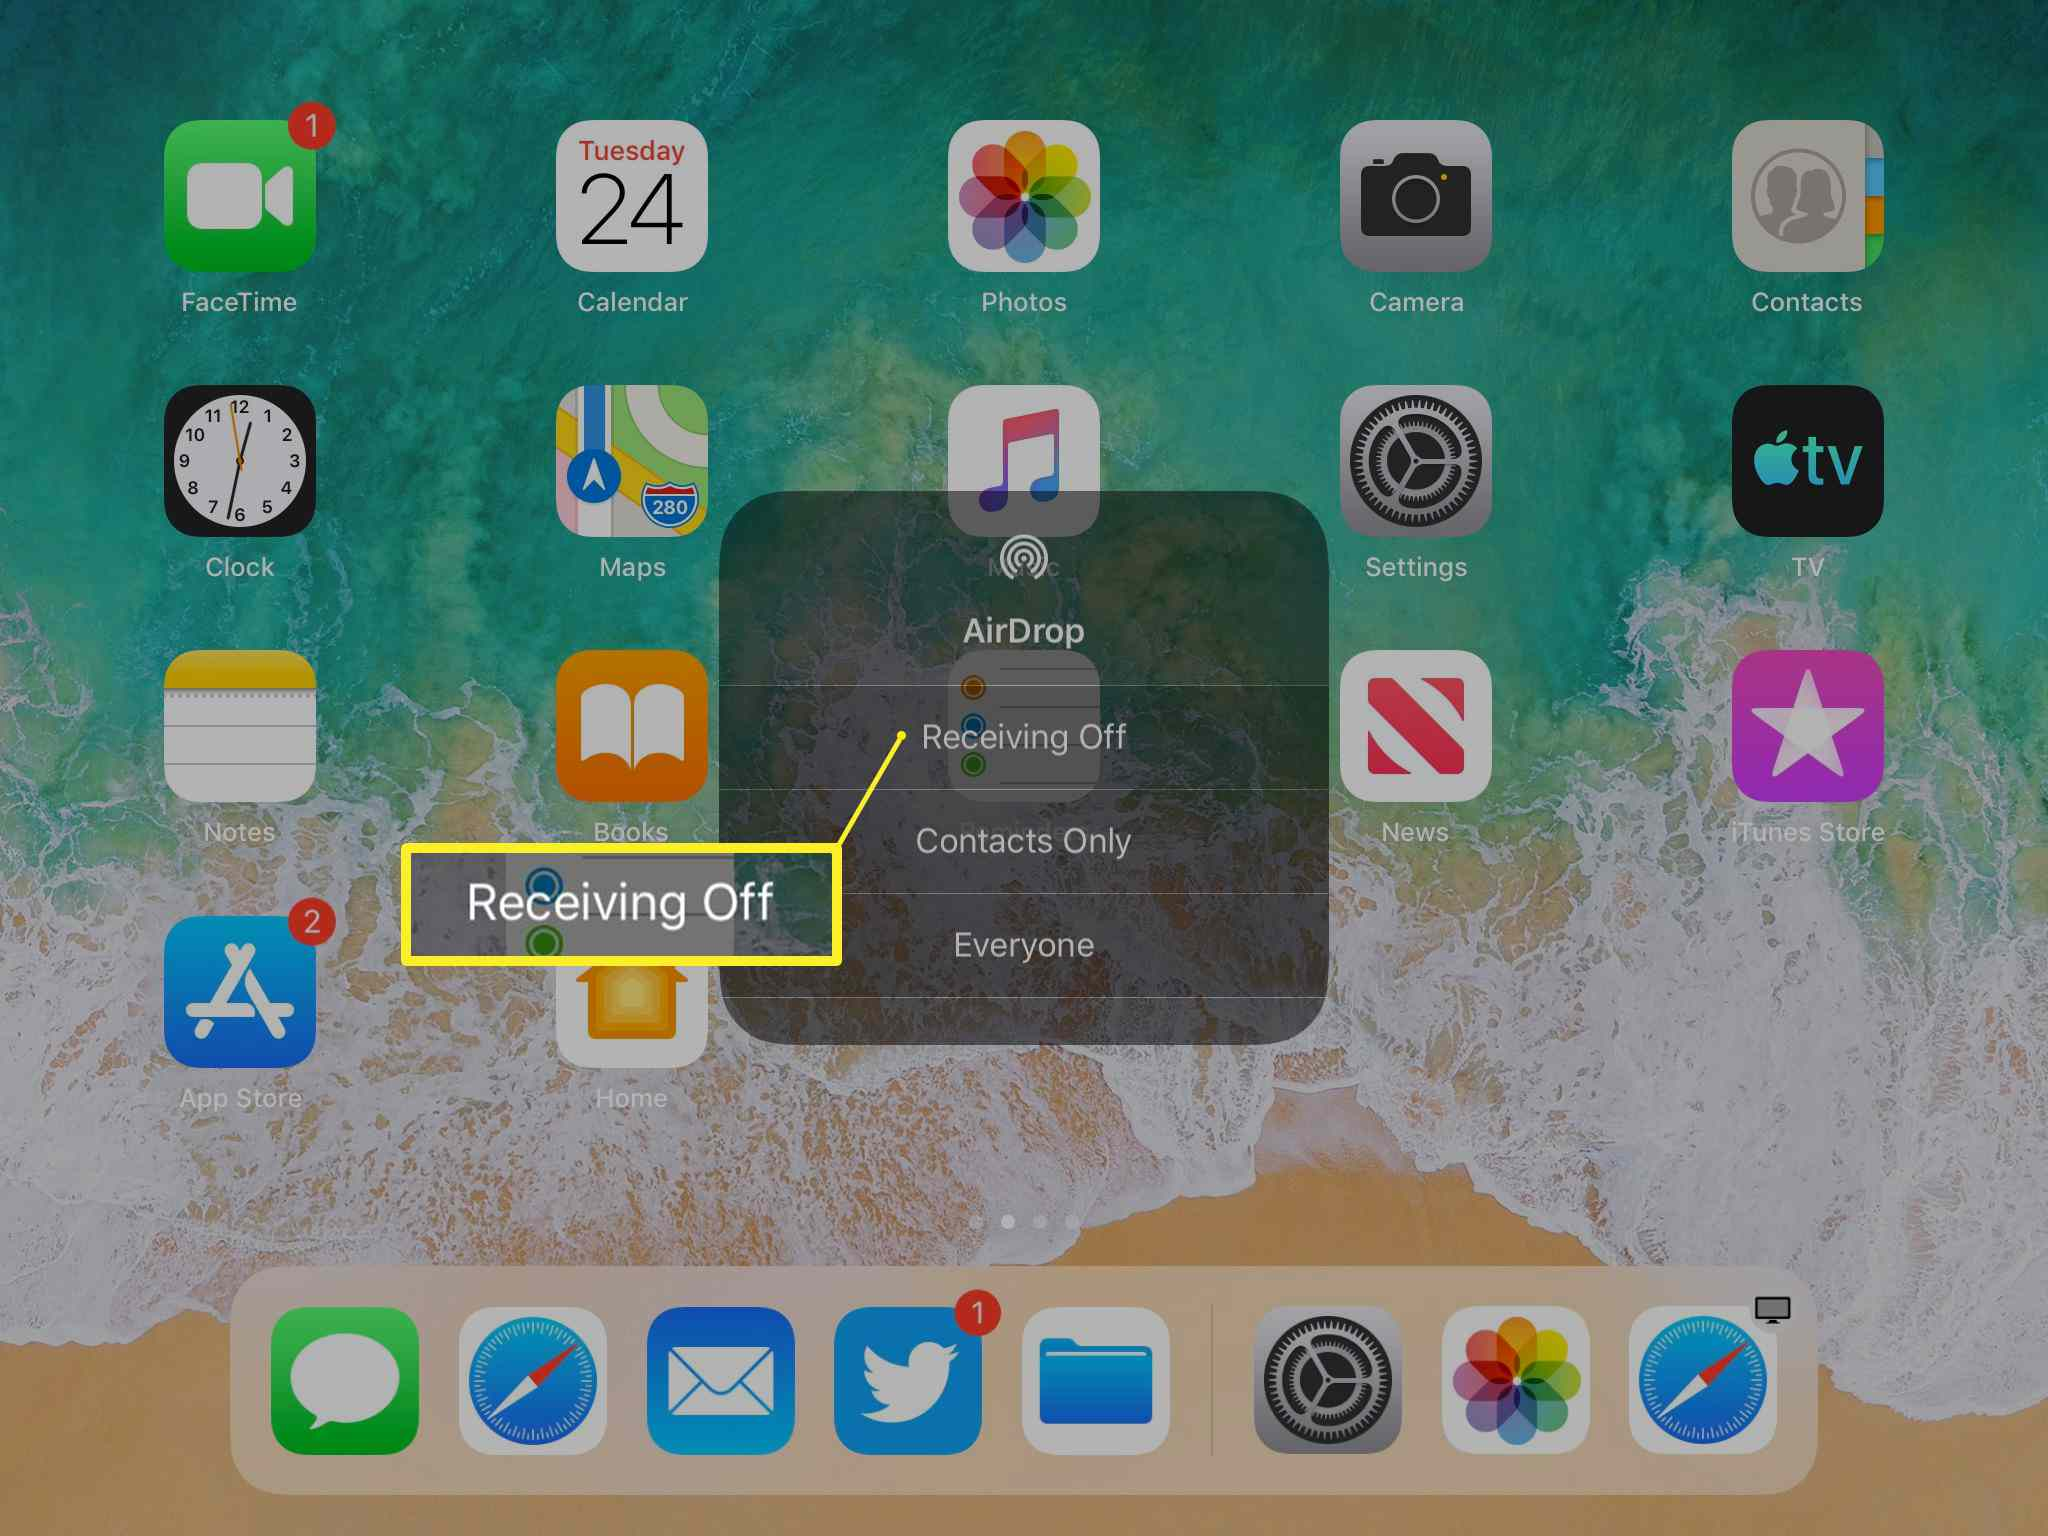 AirDrop pop-up screen